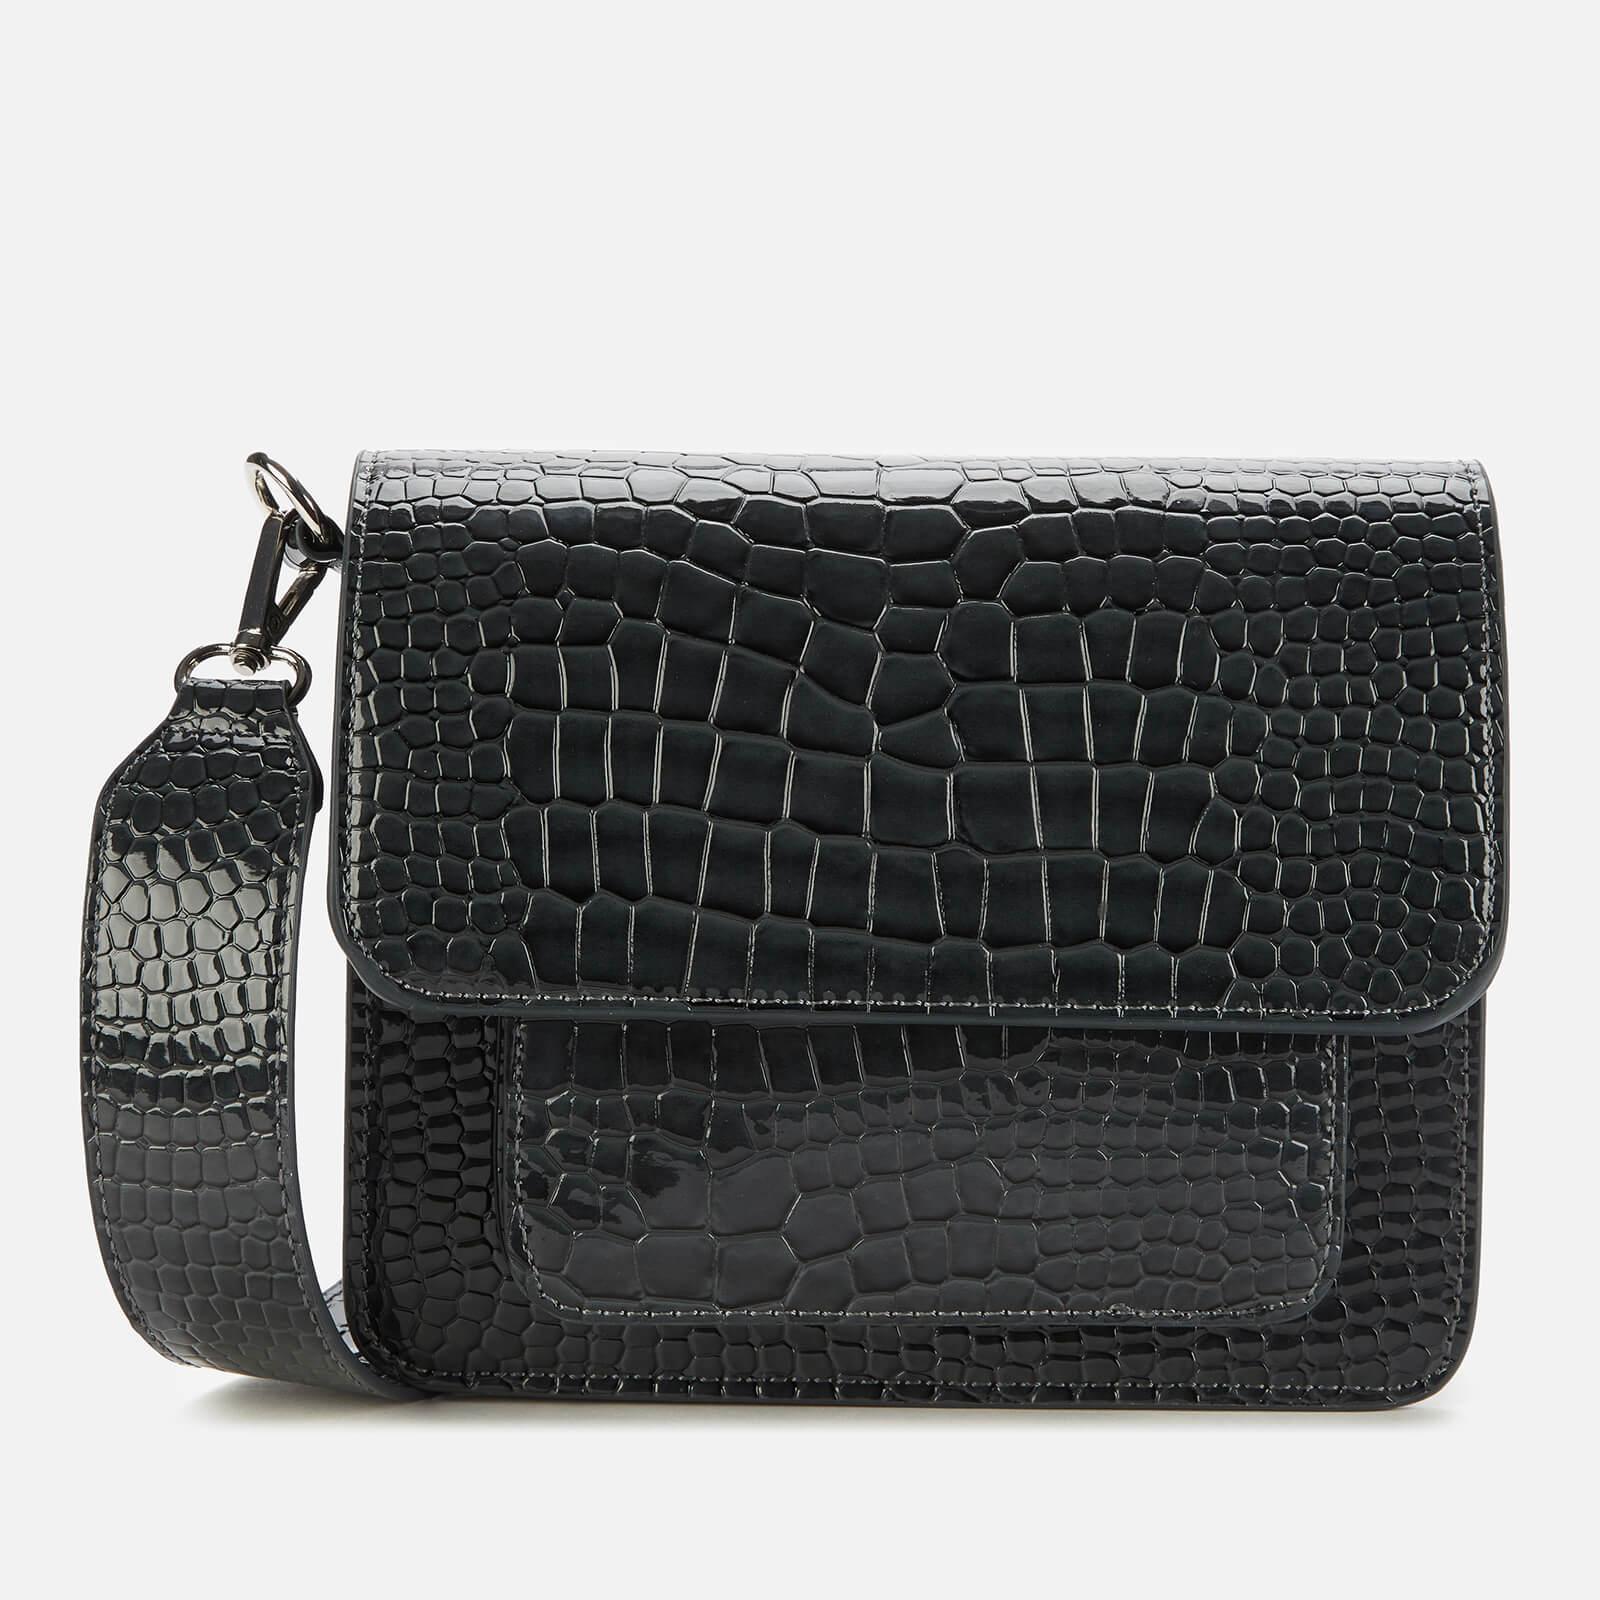 HVISK Women's Cayman Pocket Cross Body Bag - Grey Dark